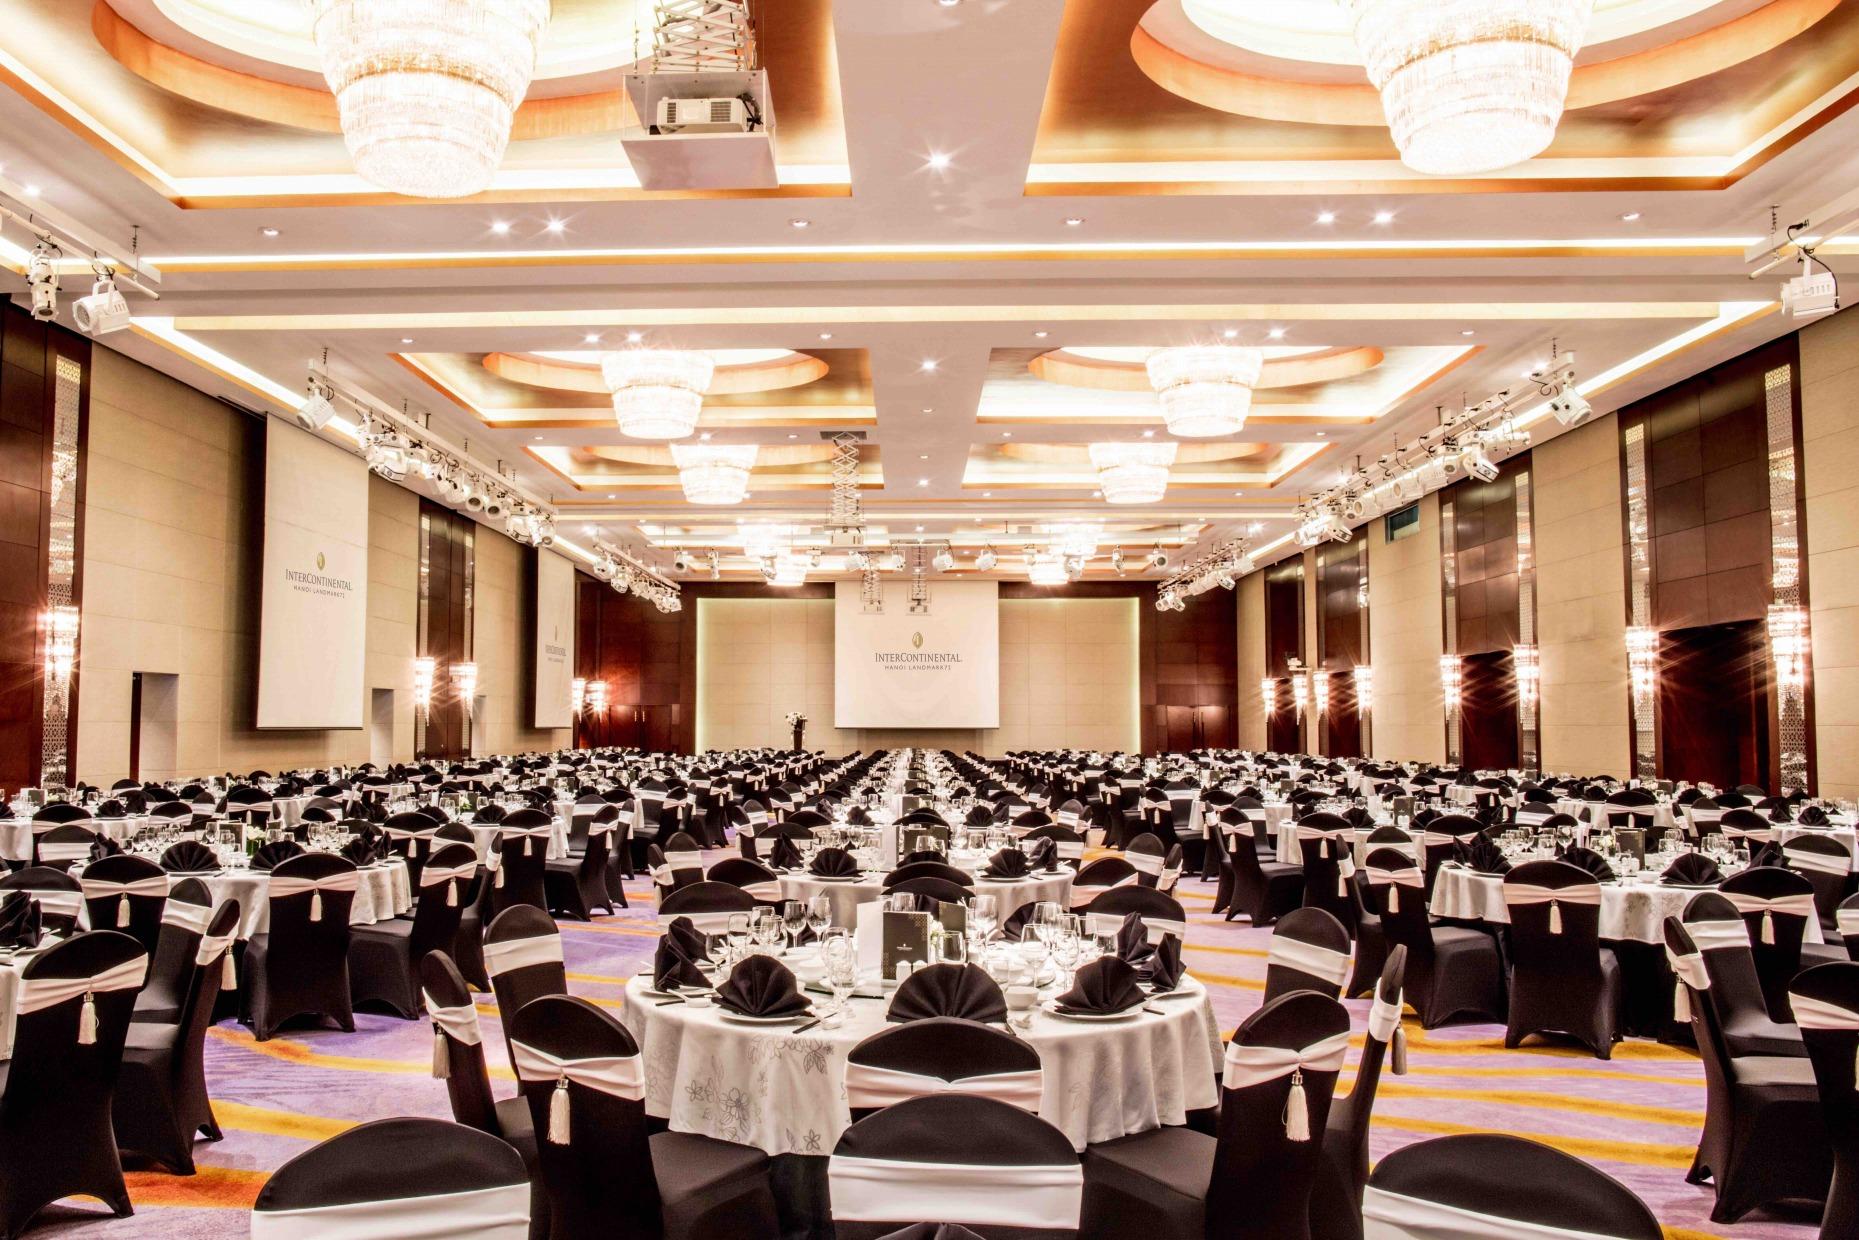 intercontinental hanoi meeting ballroom near ncc vietnam national convention center